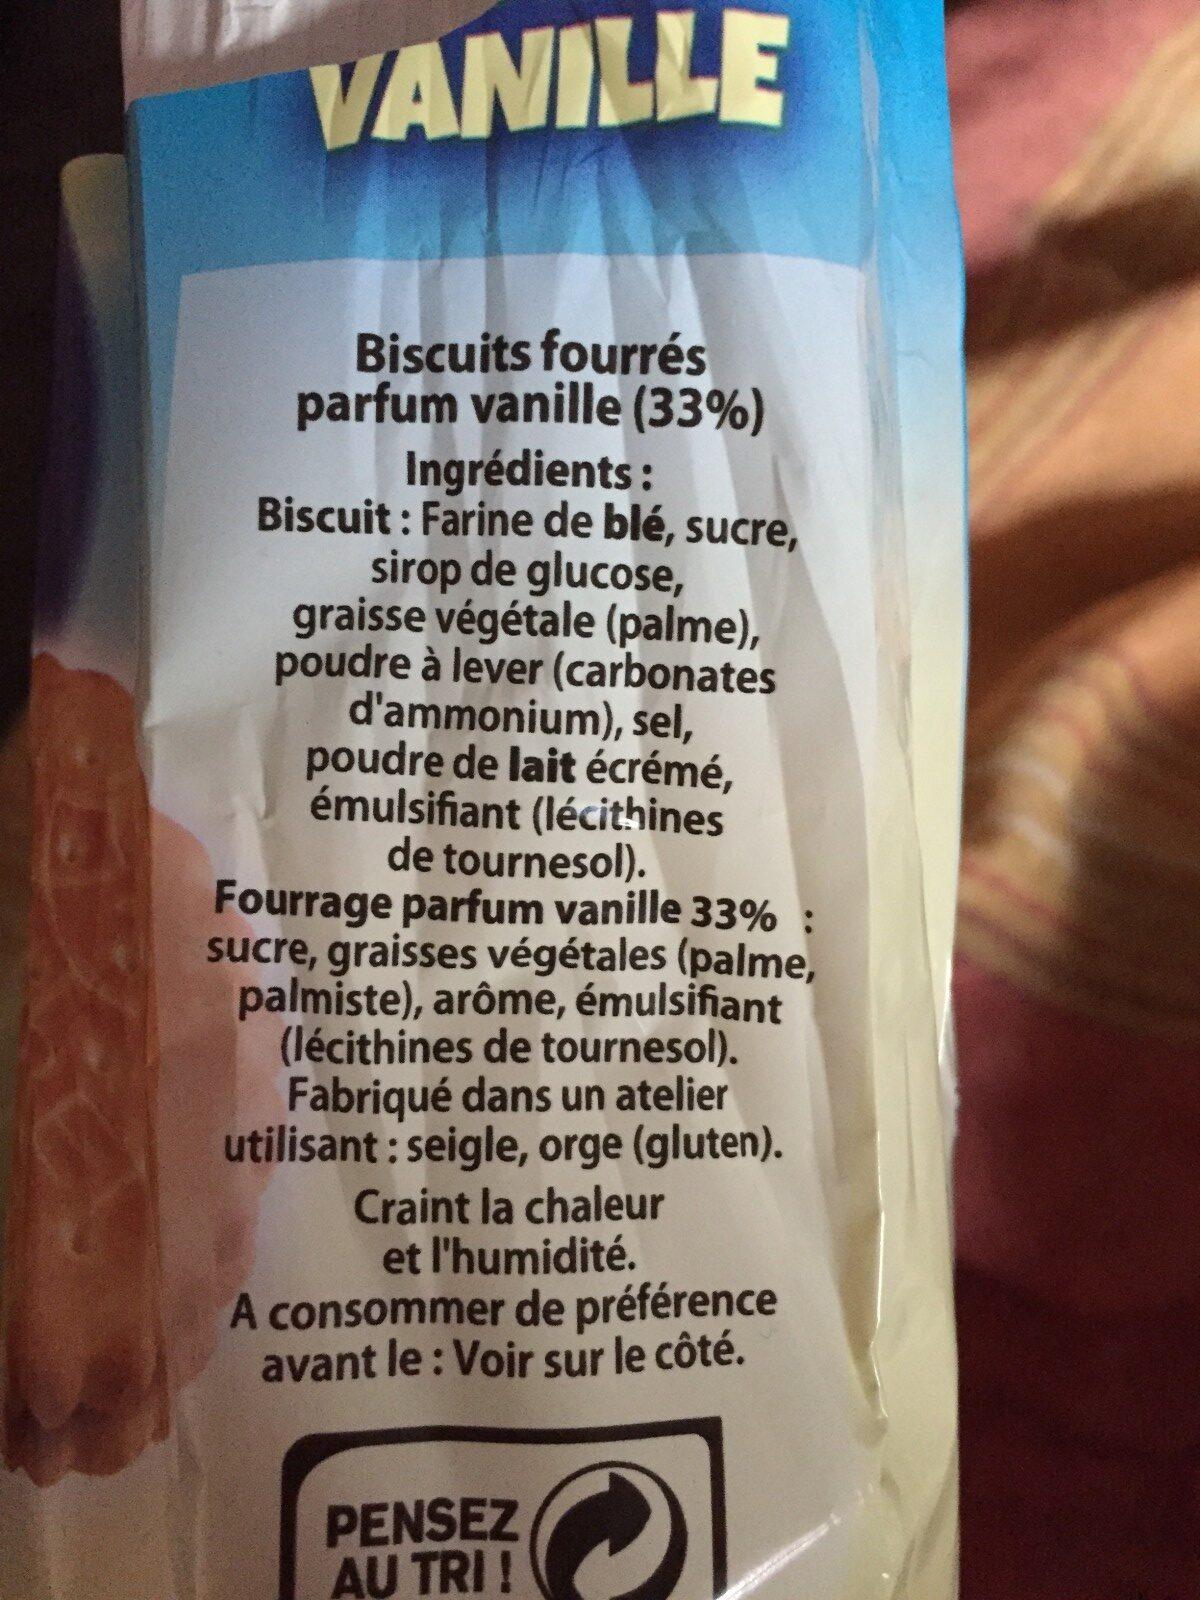 Biscuits fourrés parfum vanille - Ingredients - fr